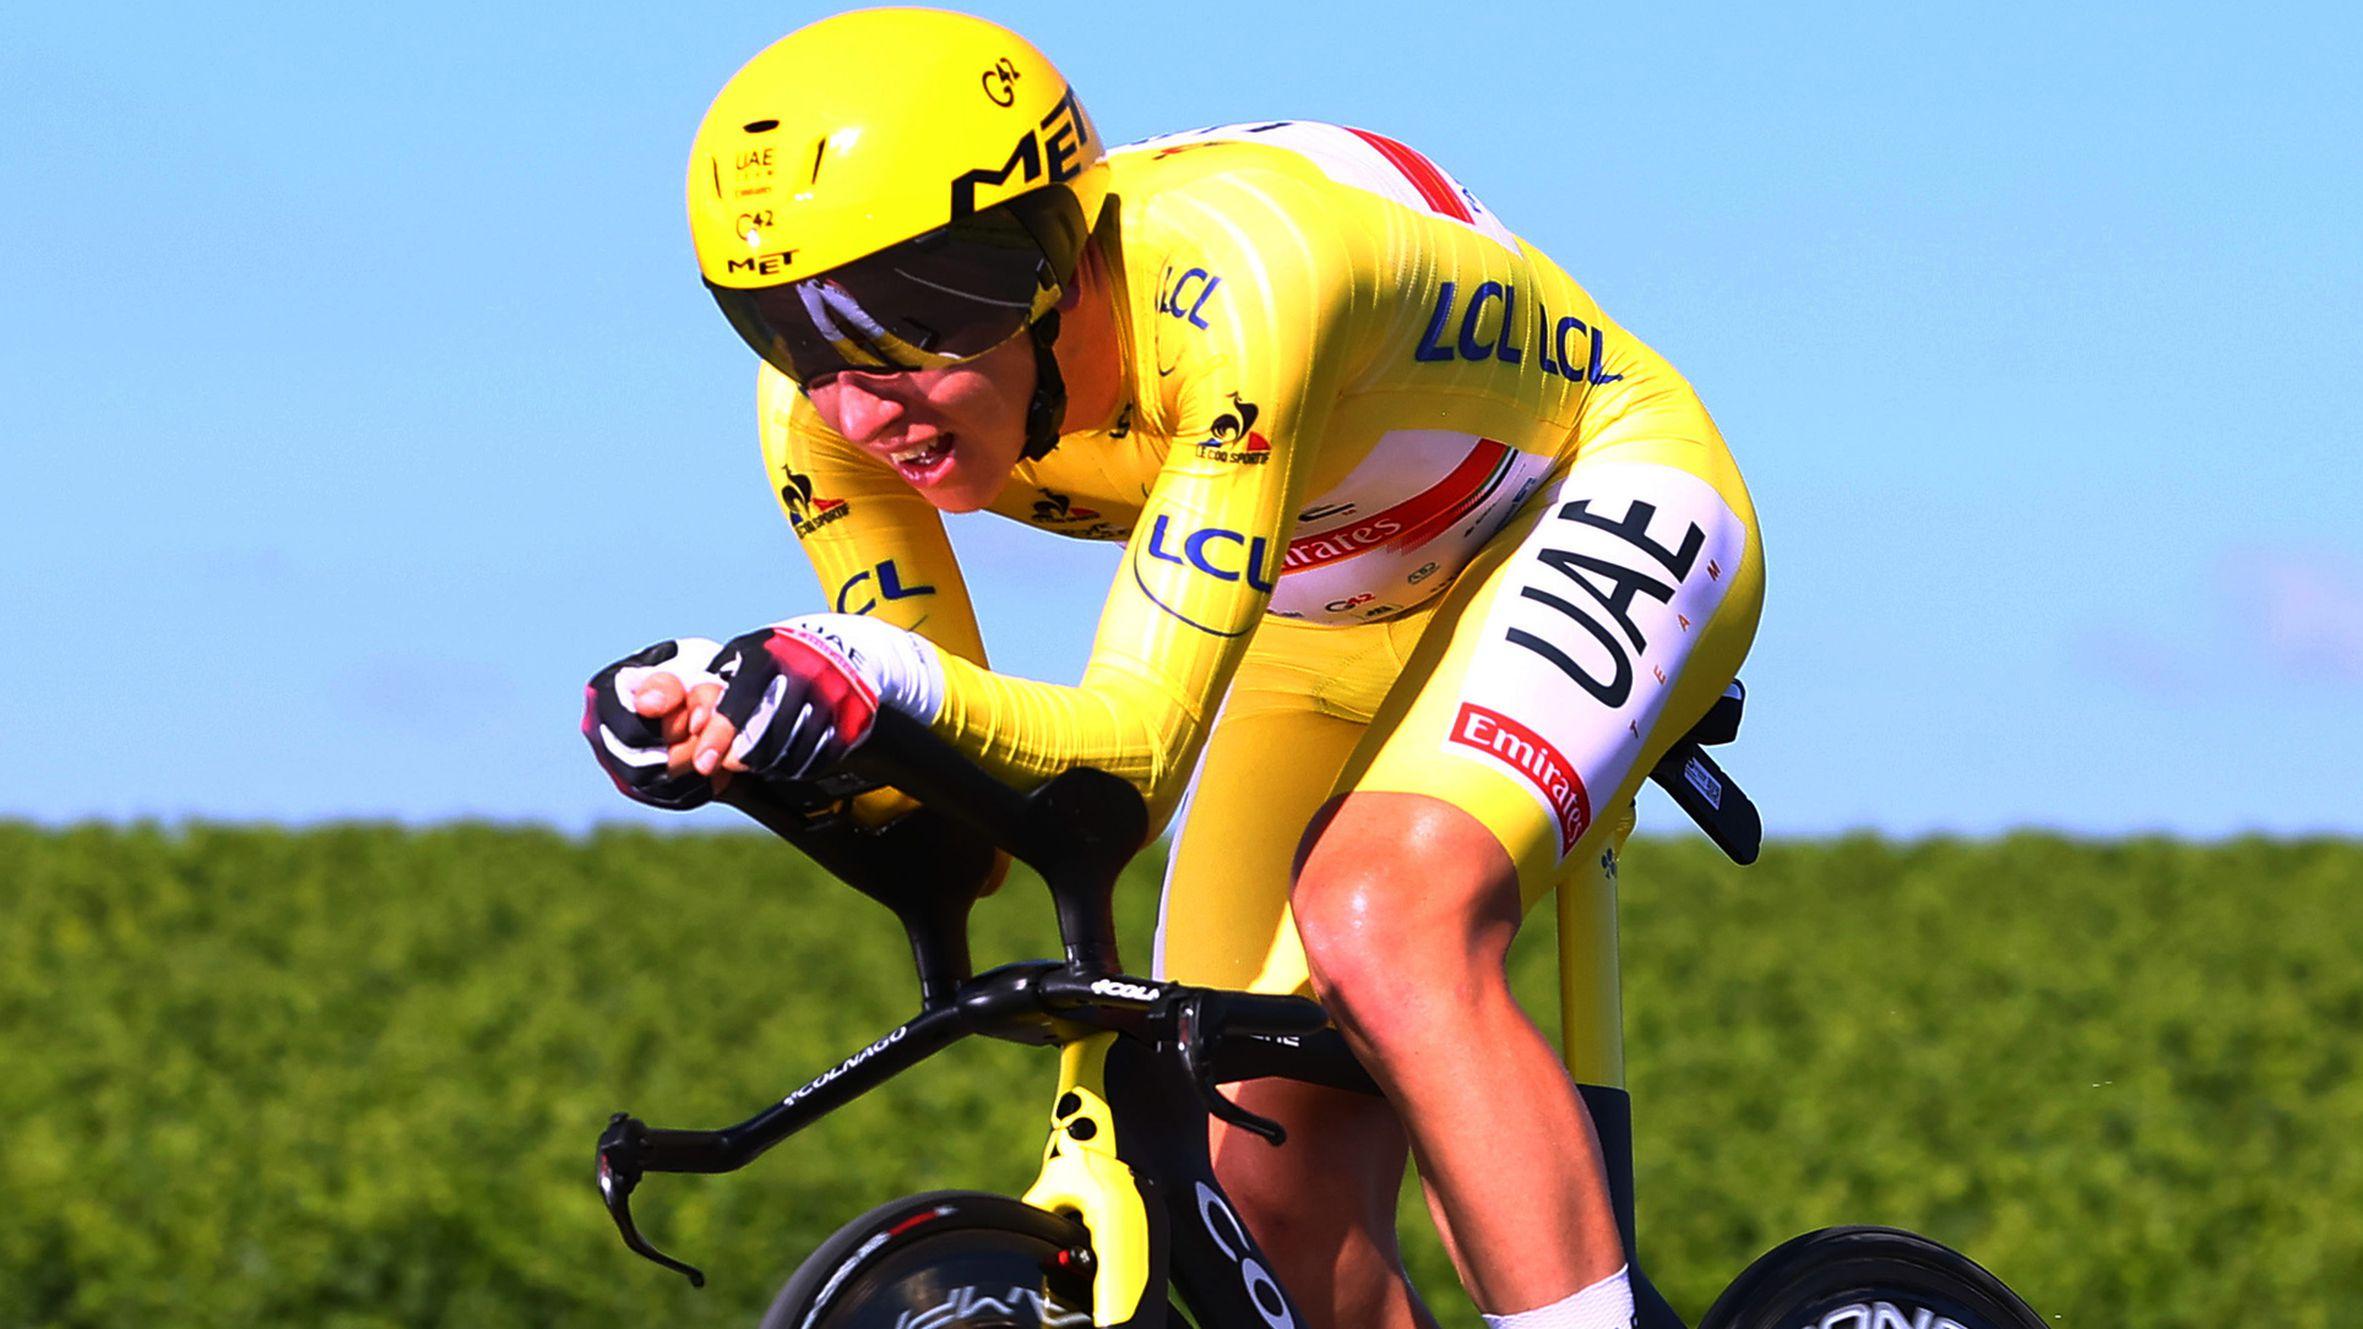 Tadej Pogacar all but seals second consecutive Tour de France title on stage 20